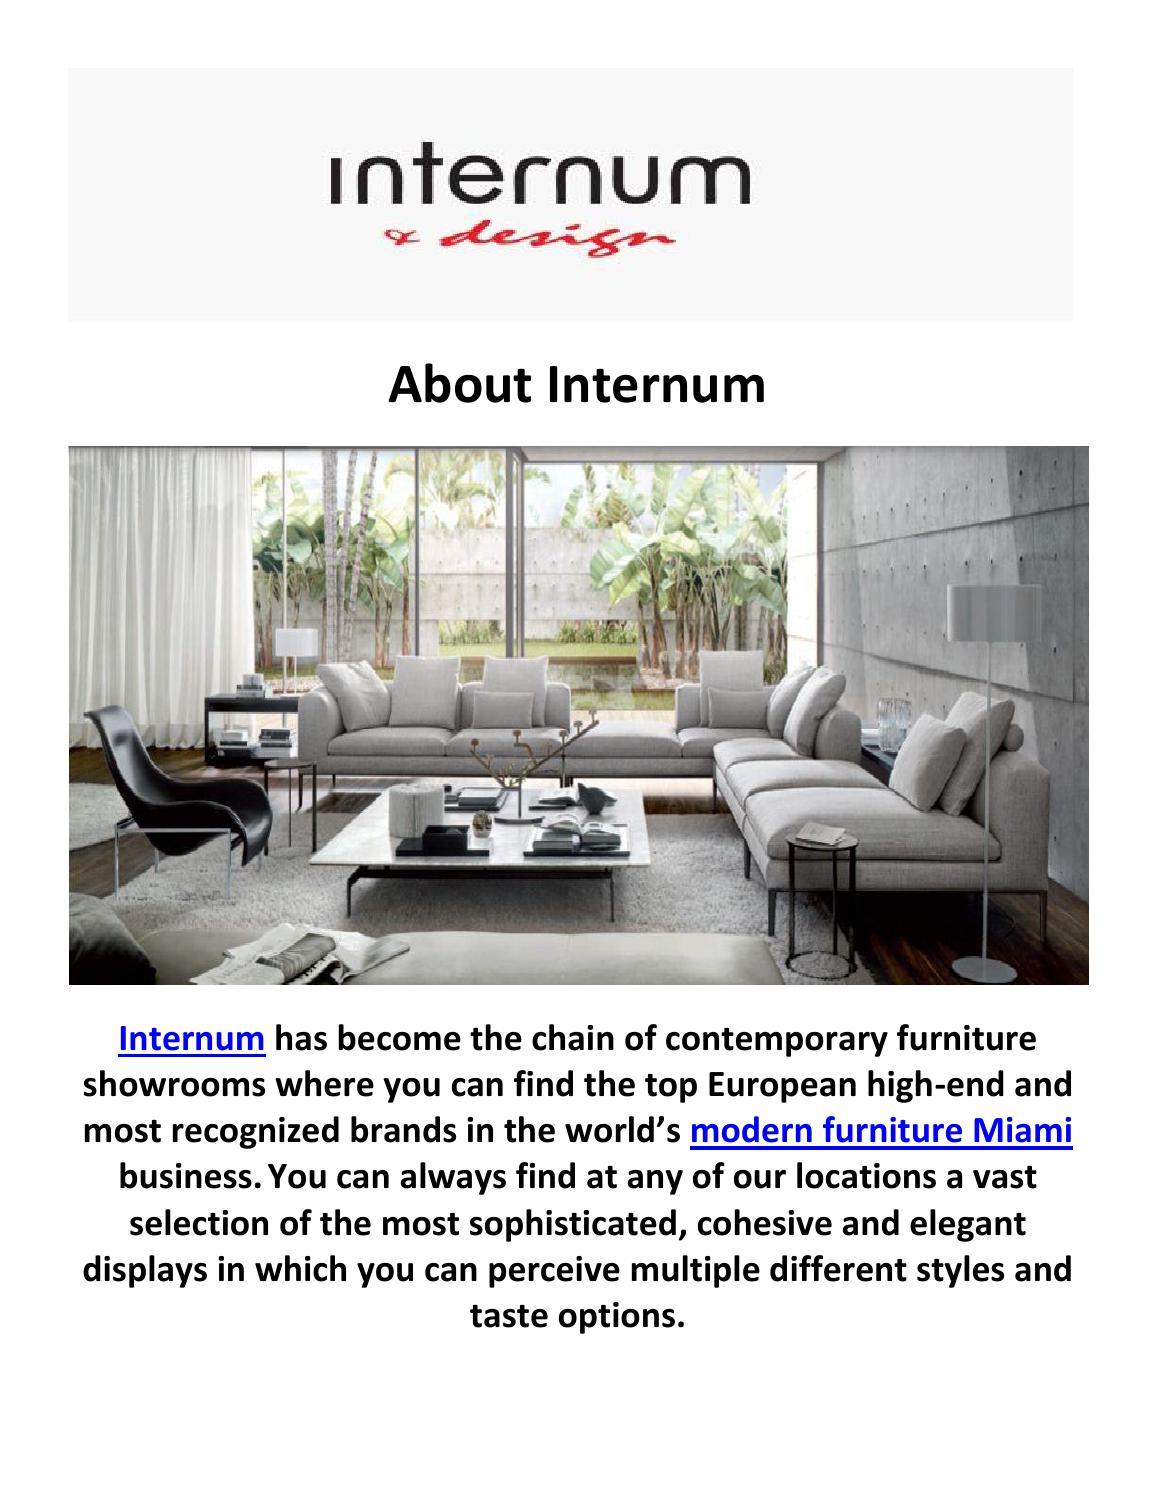 Internum Modern Furniture Miami By Internum Miami Issuu